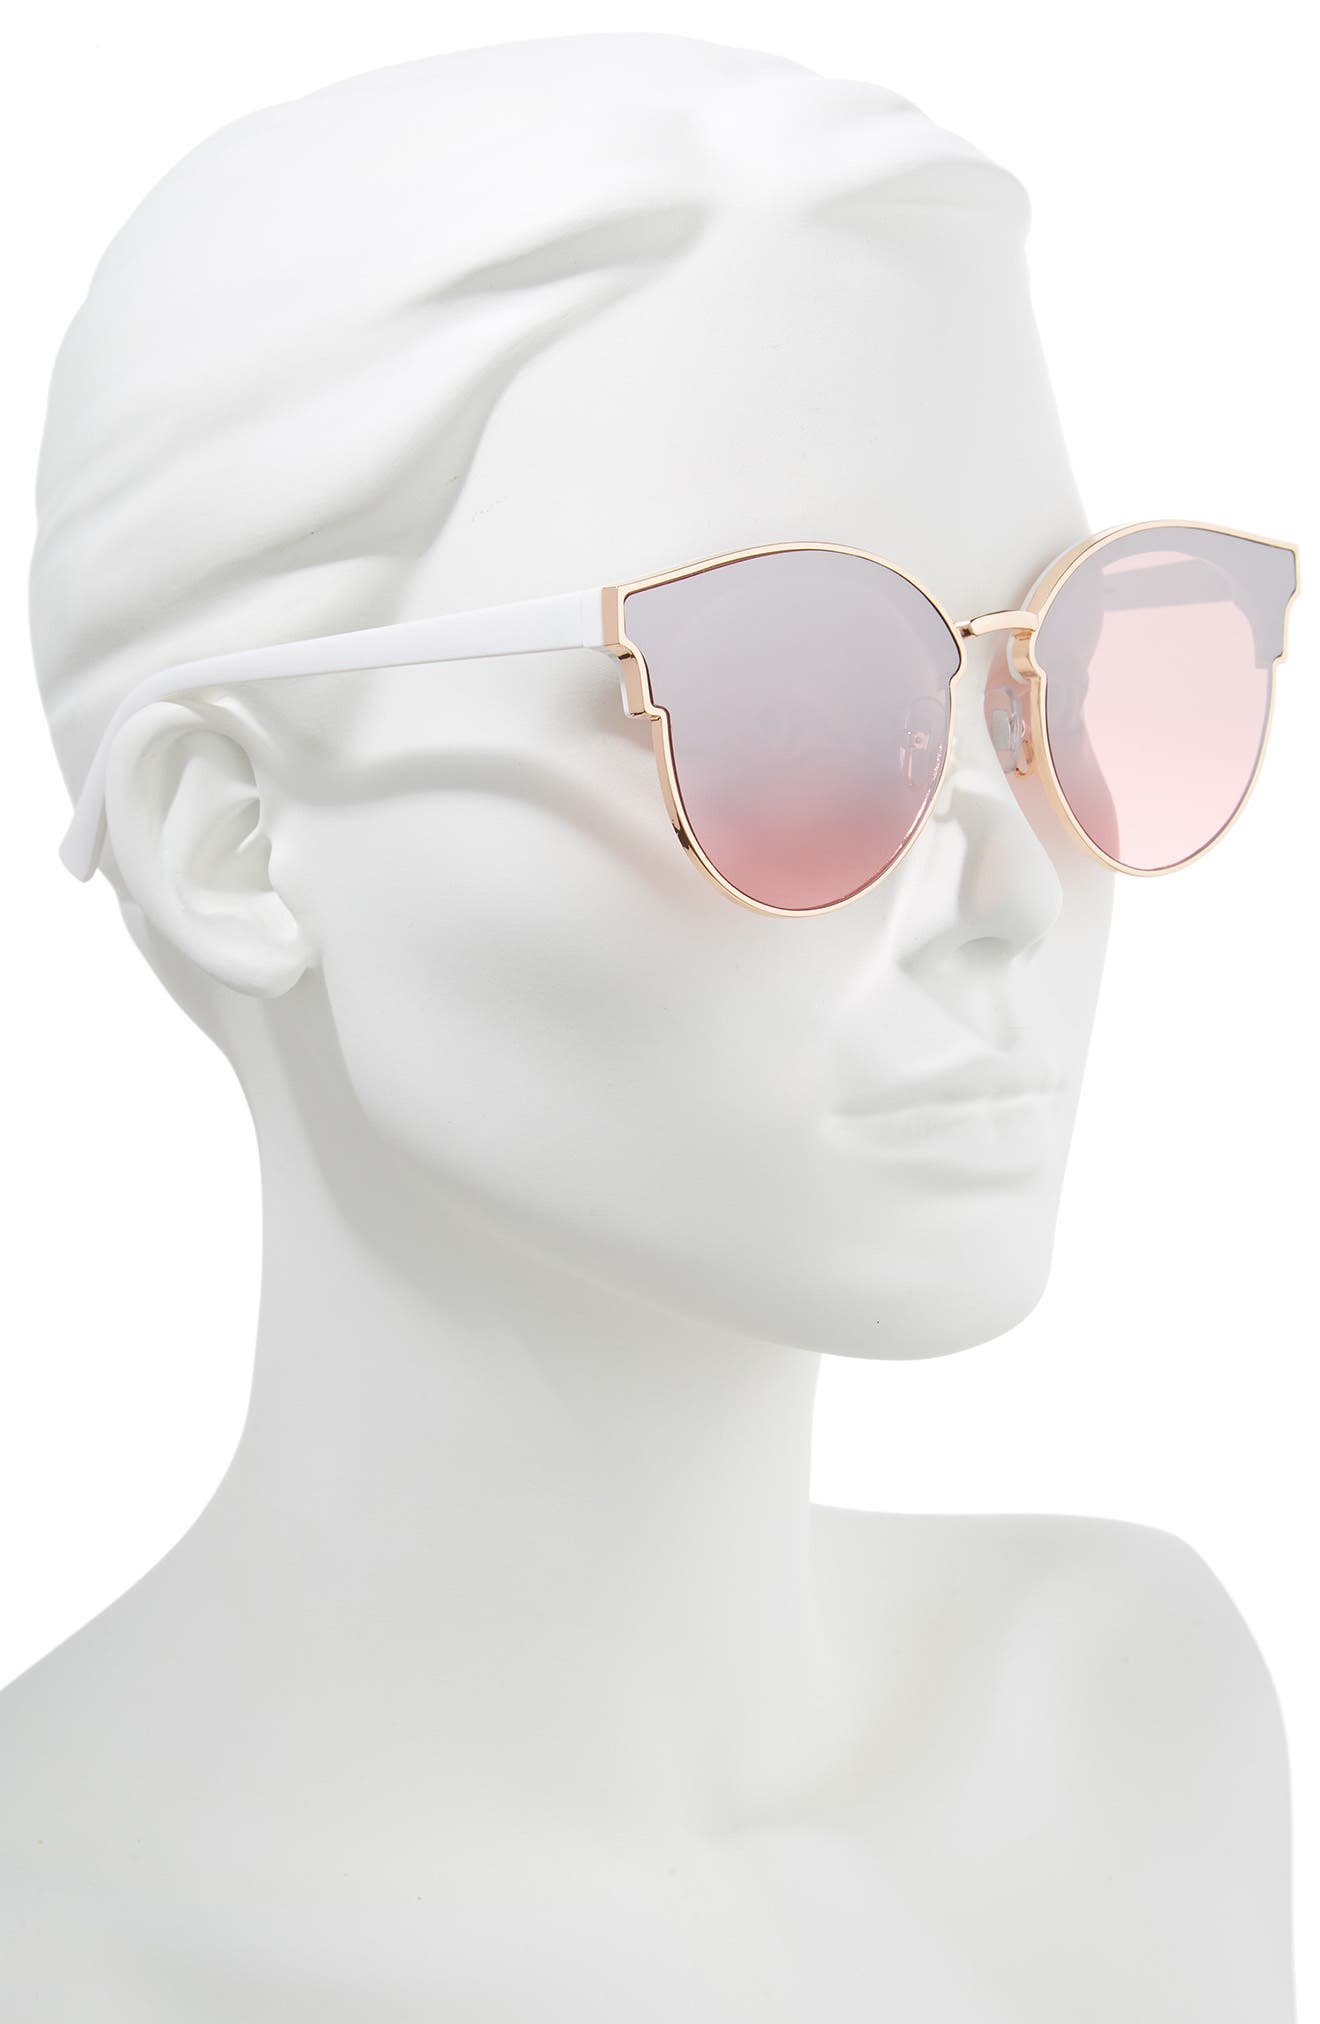 58mm Flat Cat Eye Sunglasses,                             Alternate thumbnail 2, color,